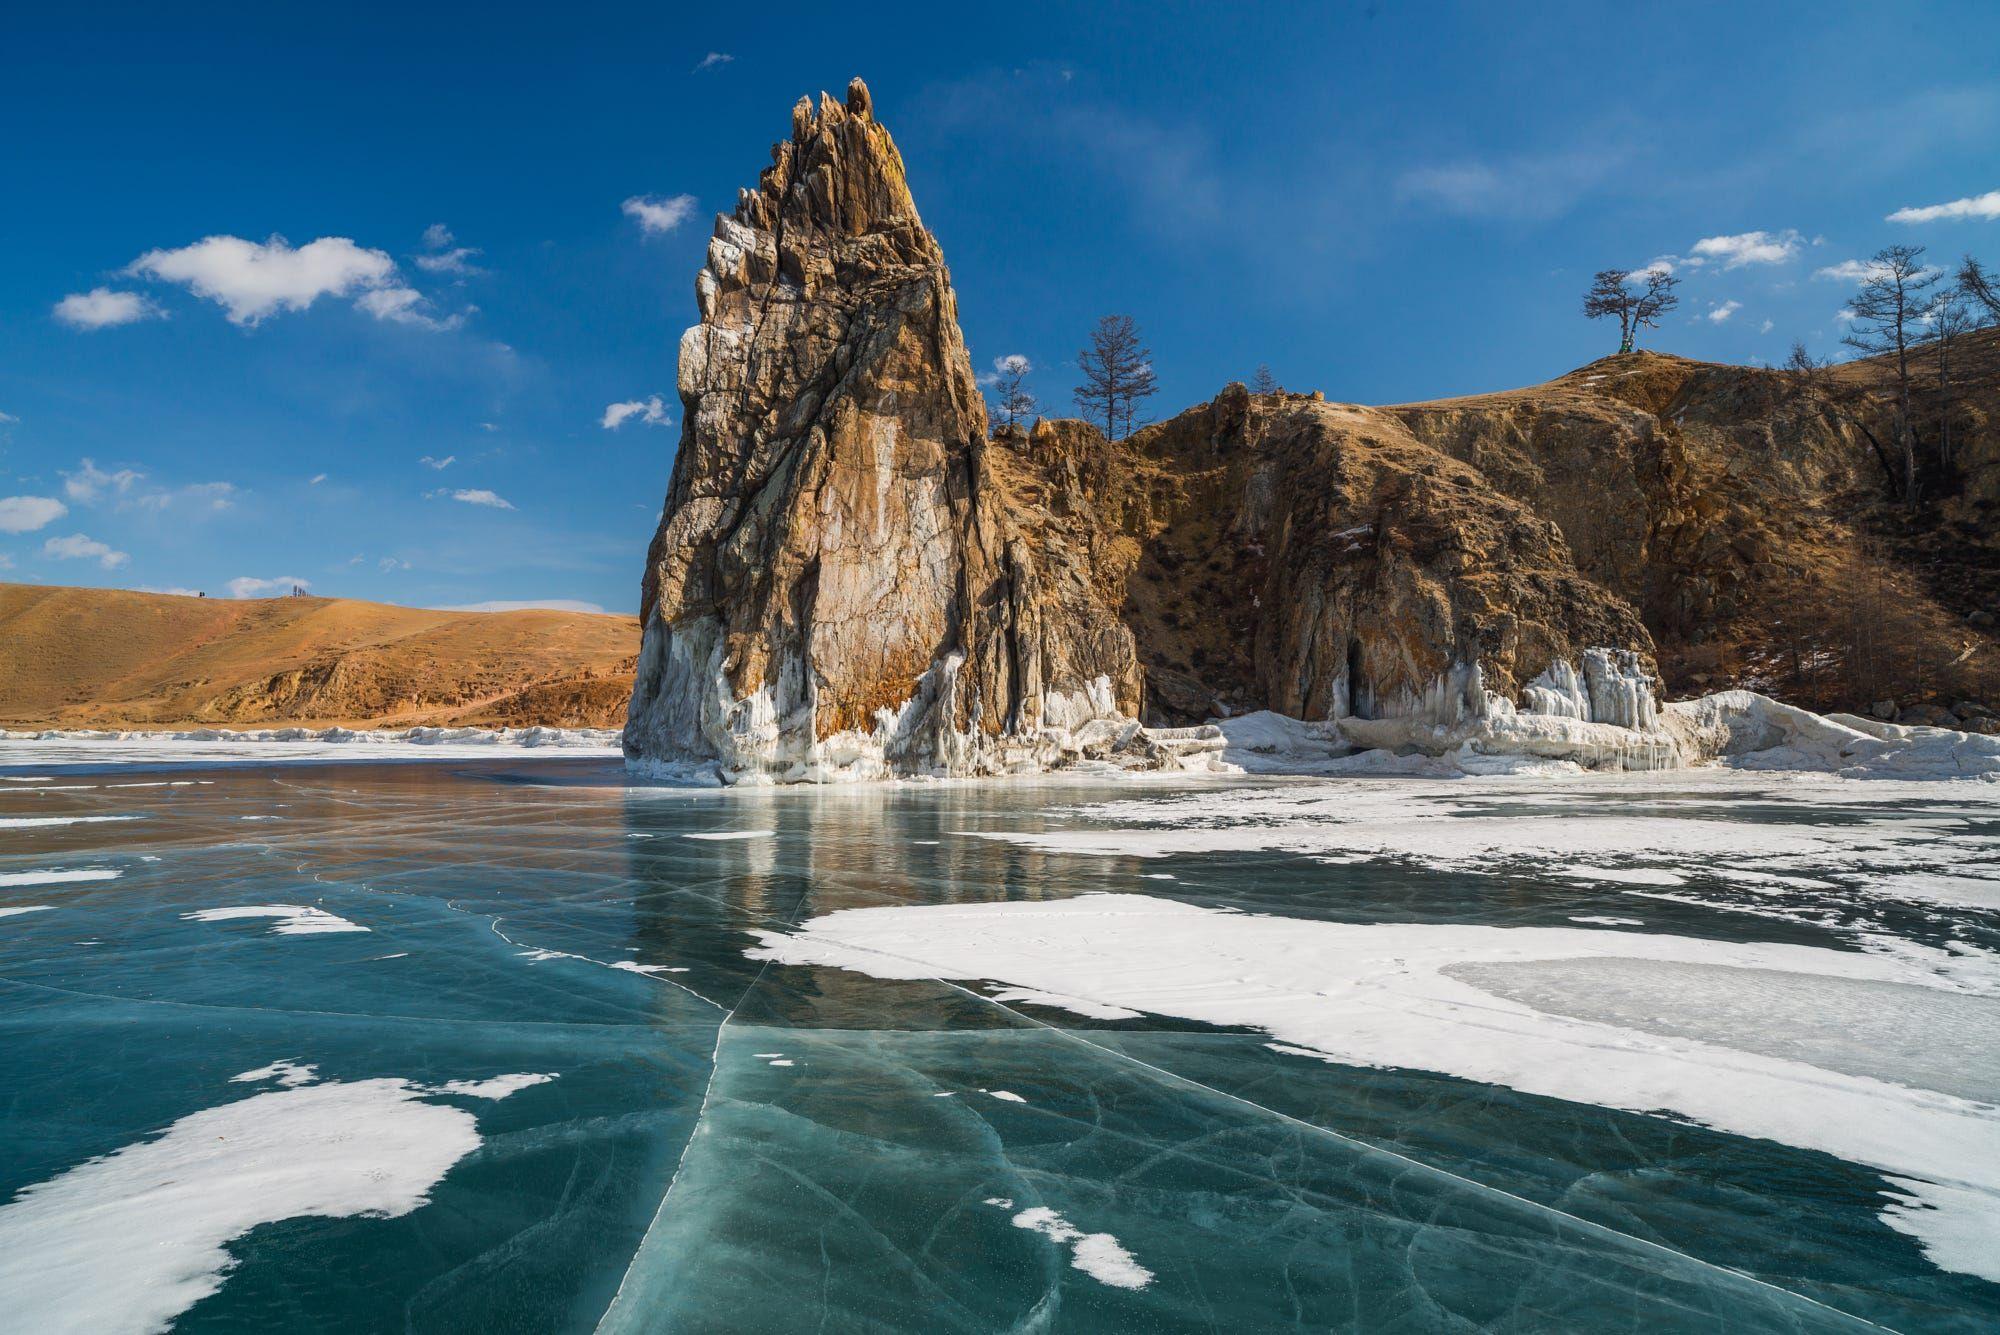 Baikal Lake, Russia. March 2015.